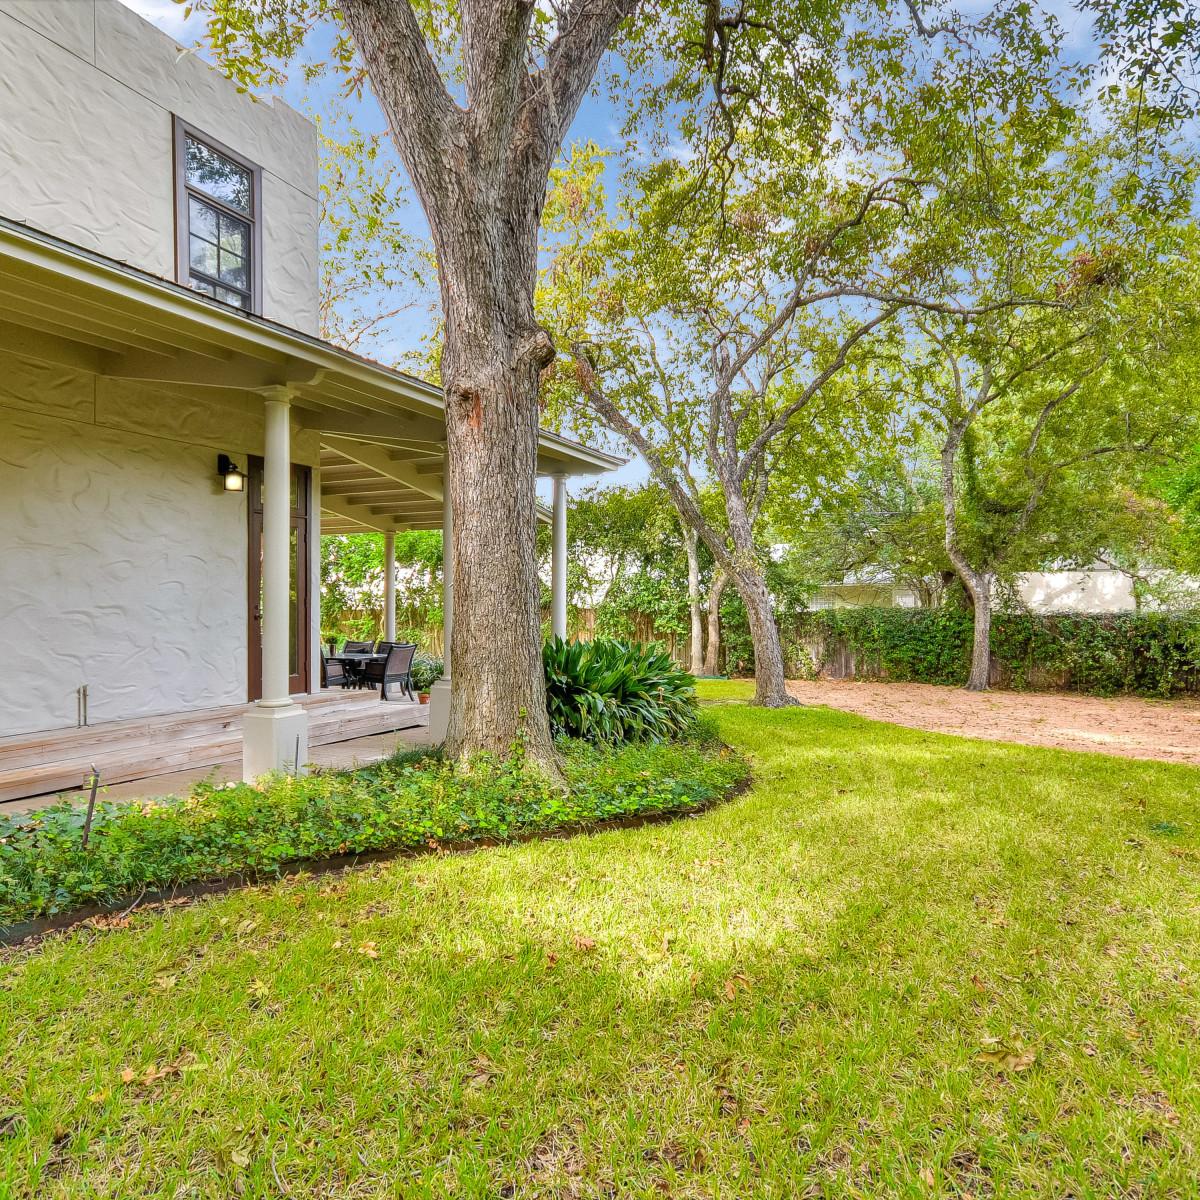 141 Cloverleaf San Antonio house for sale backyard